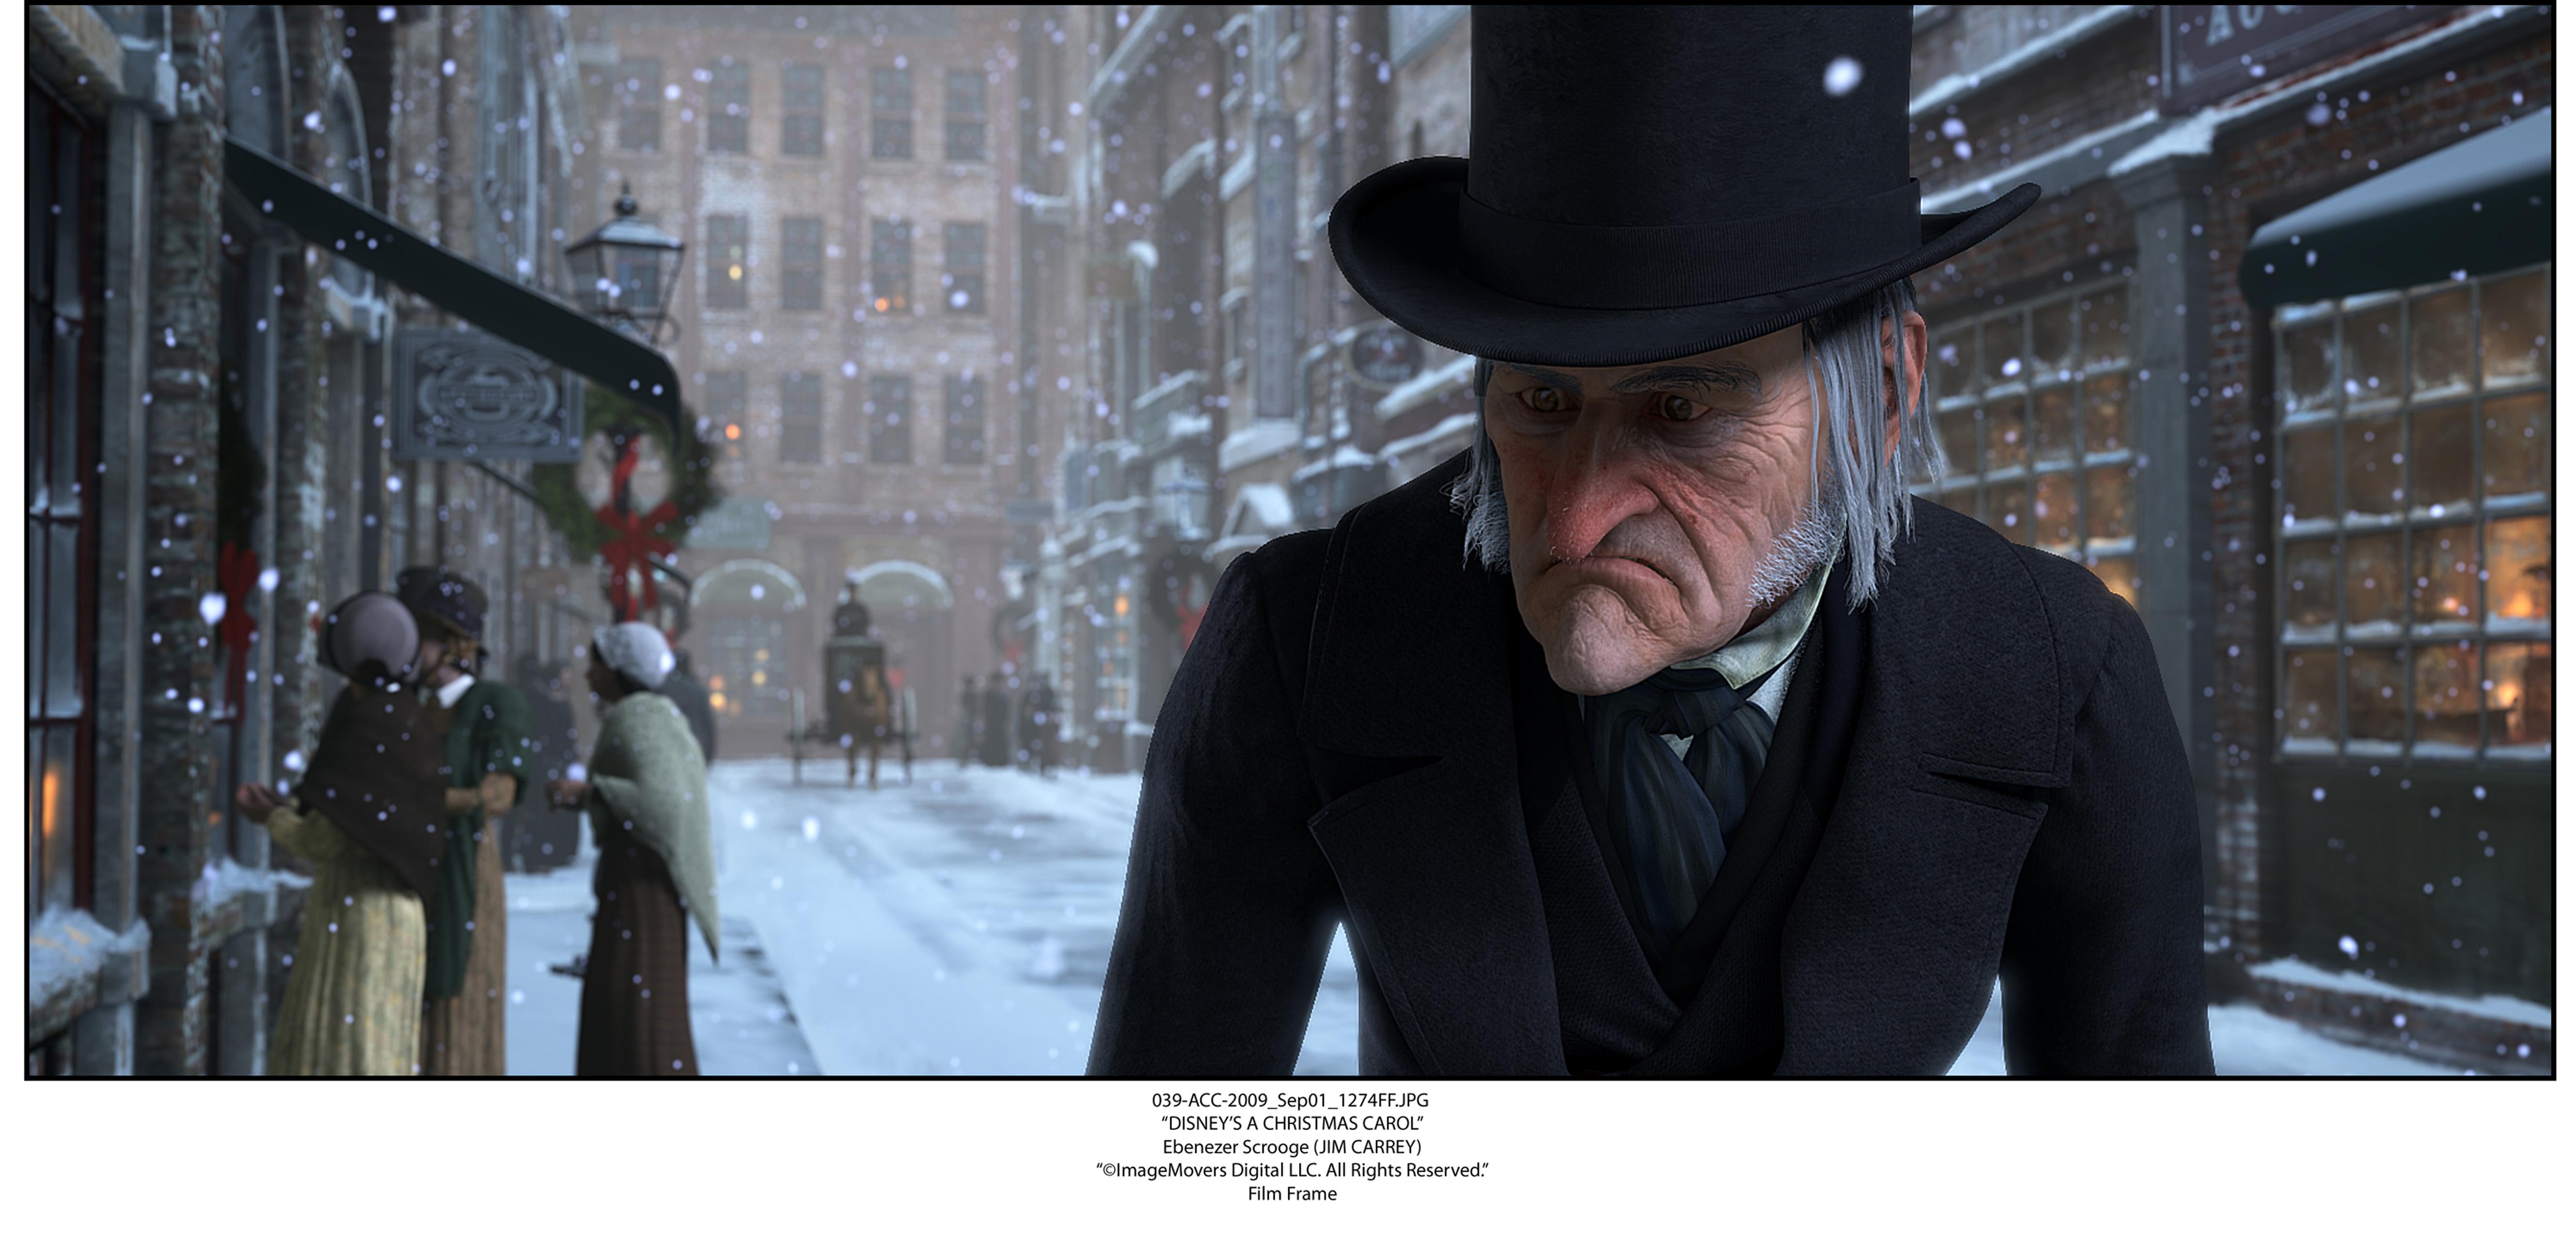 disneys a christmas carol video game 2009 photo gallery imdb - A Christmas Carol Disney